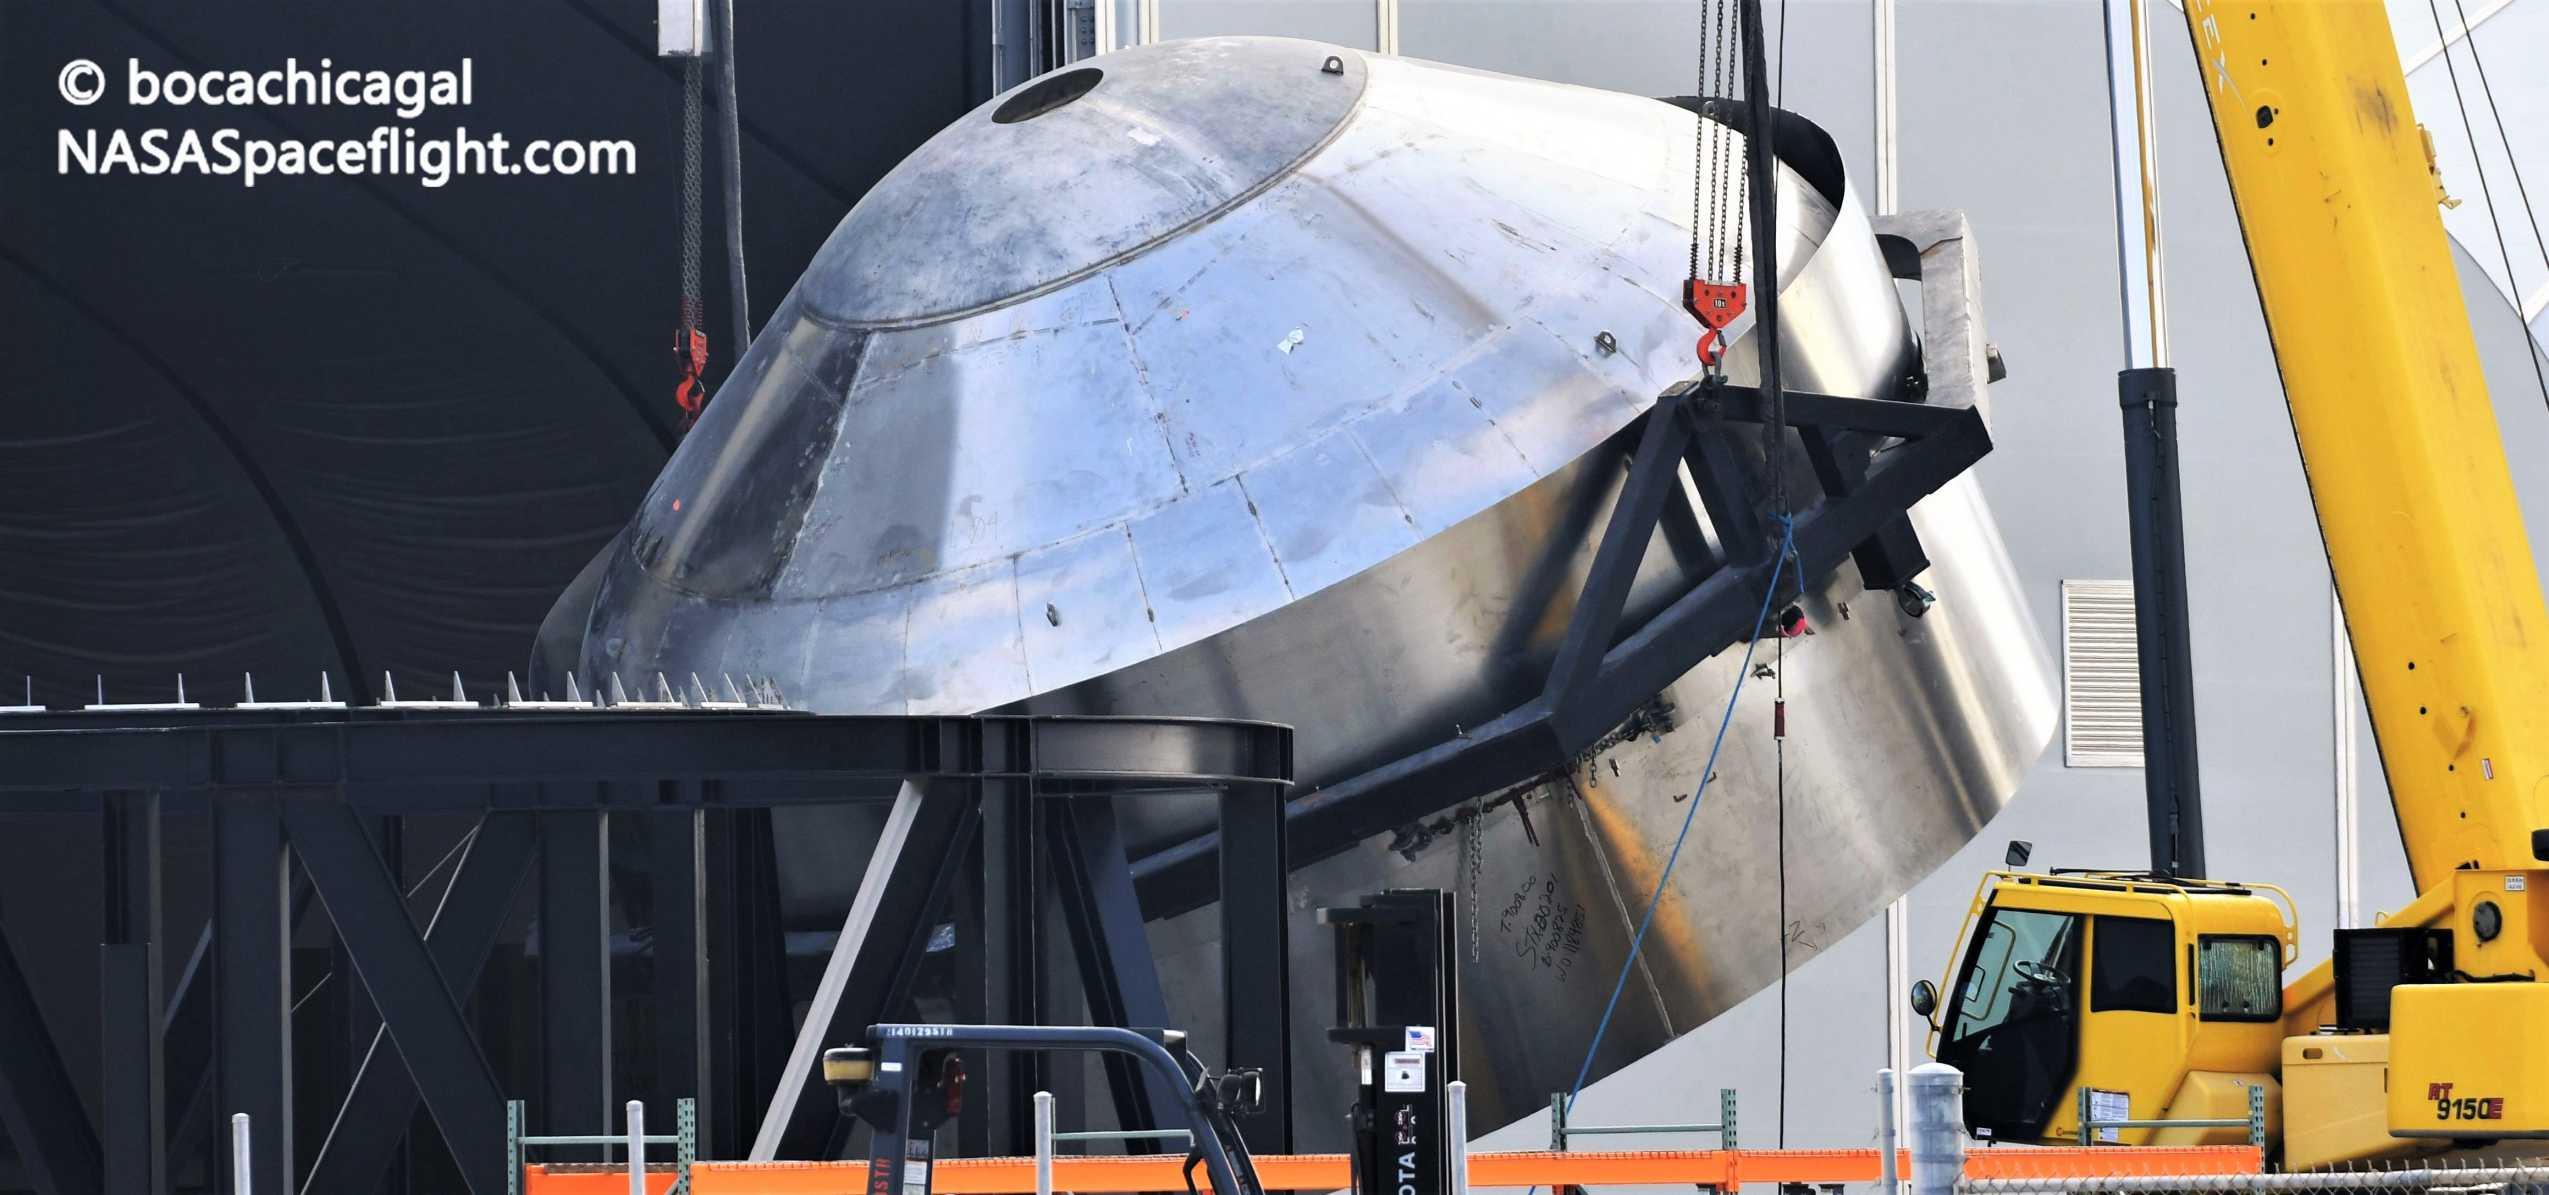 Starship Boca Chica 060920 (NASASpaceflight – bocachicagal) SN7 common dome flip 2 crop (c)